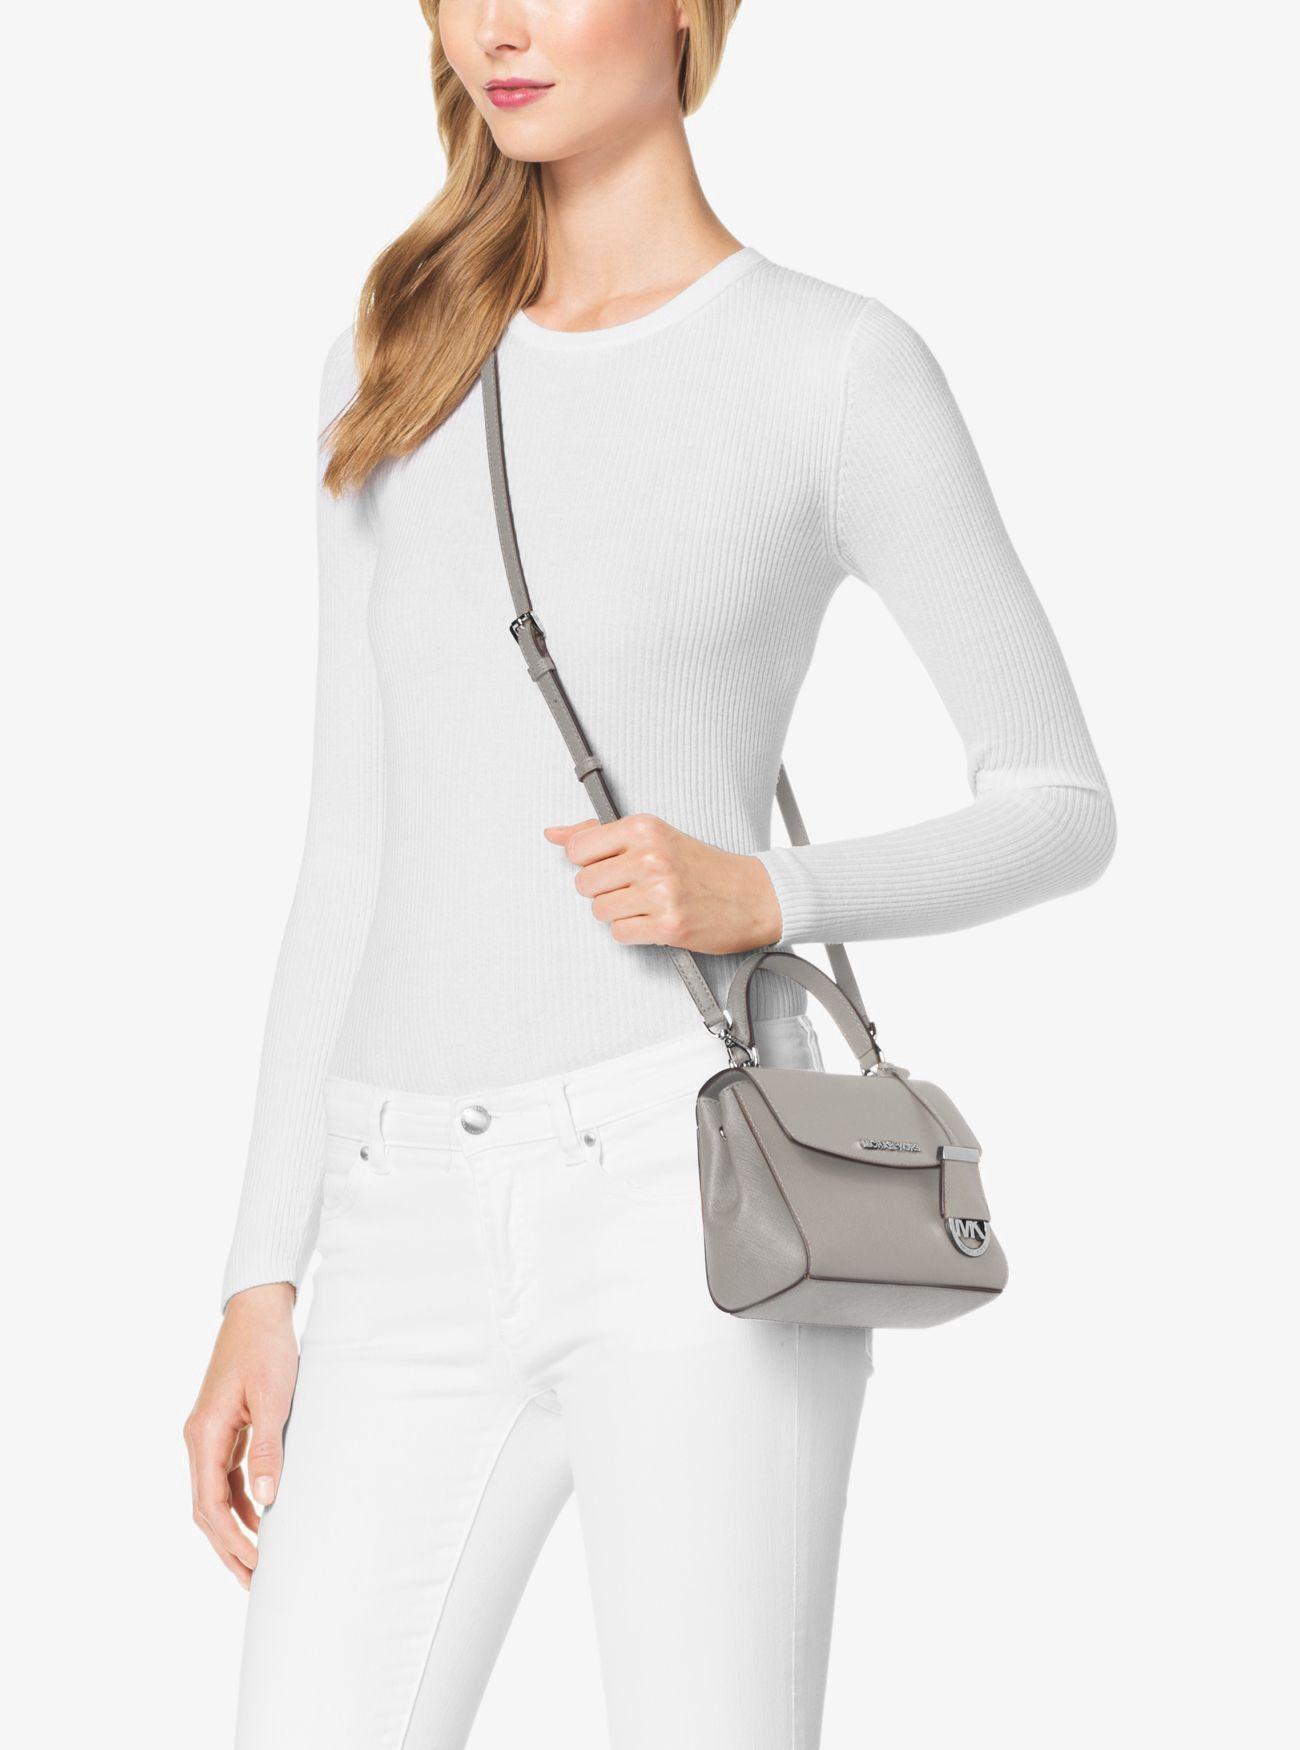 0b240e3e54d5 MICHAEL KORS Ava Extra-Small Saffiano Leather Crossbody.  michaelkors  bags   shoulder bags  leather  crossbody